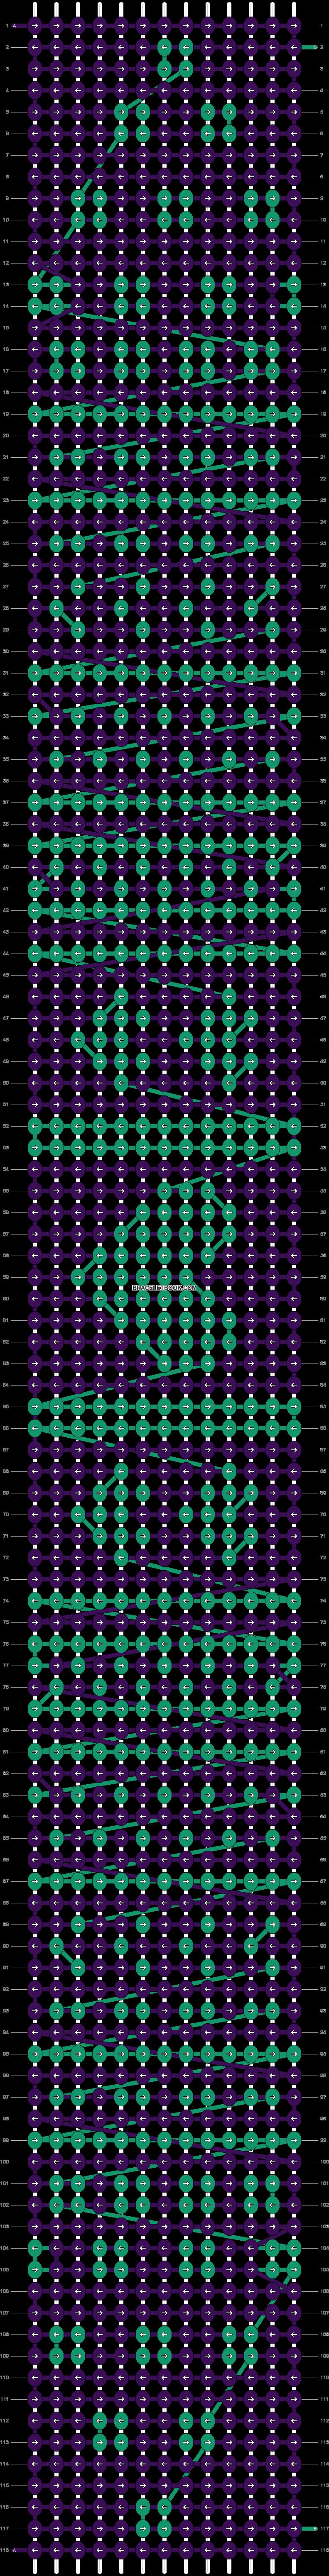 Alpha pattern #89624 variation #161859 pattern